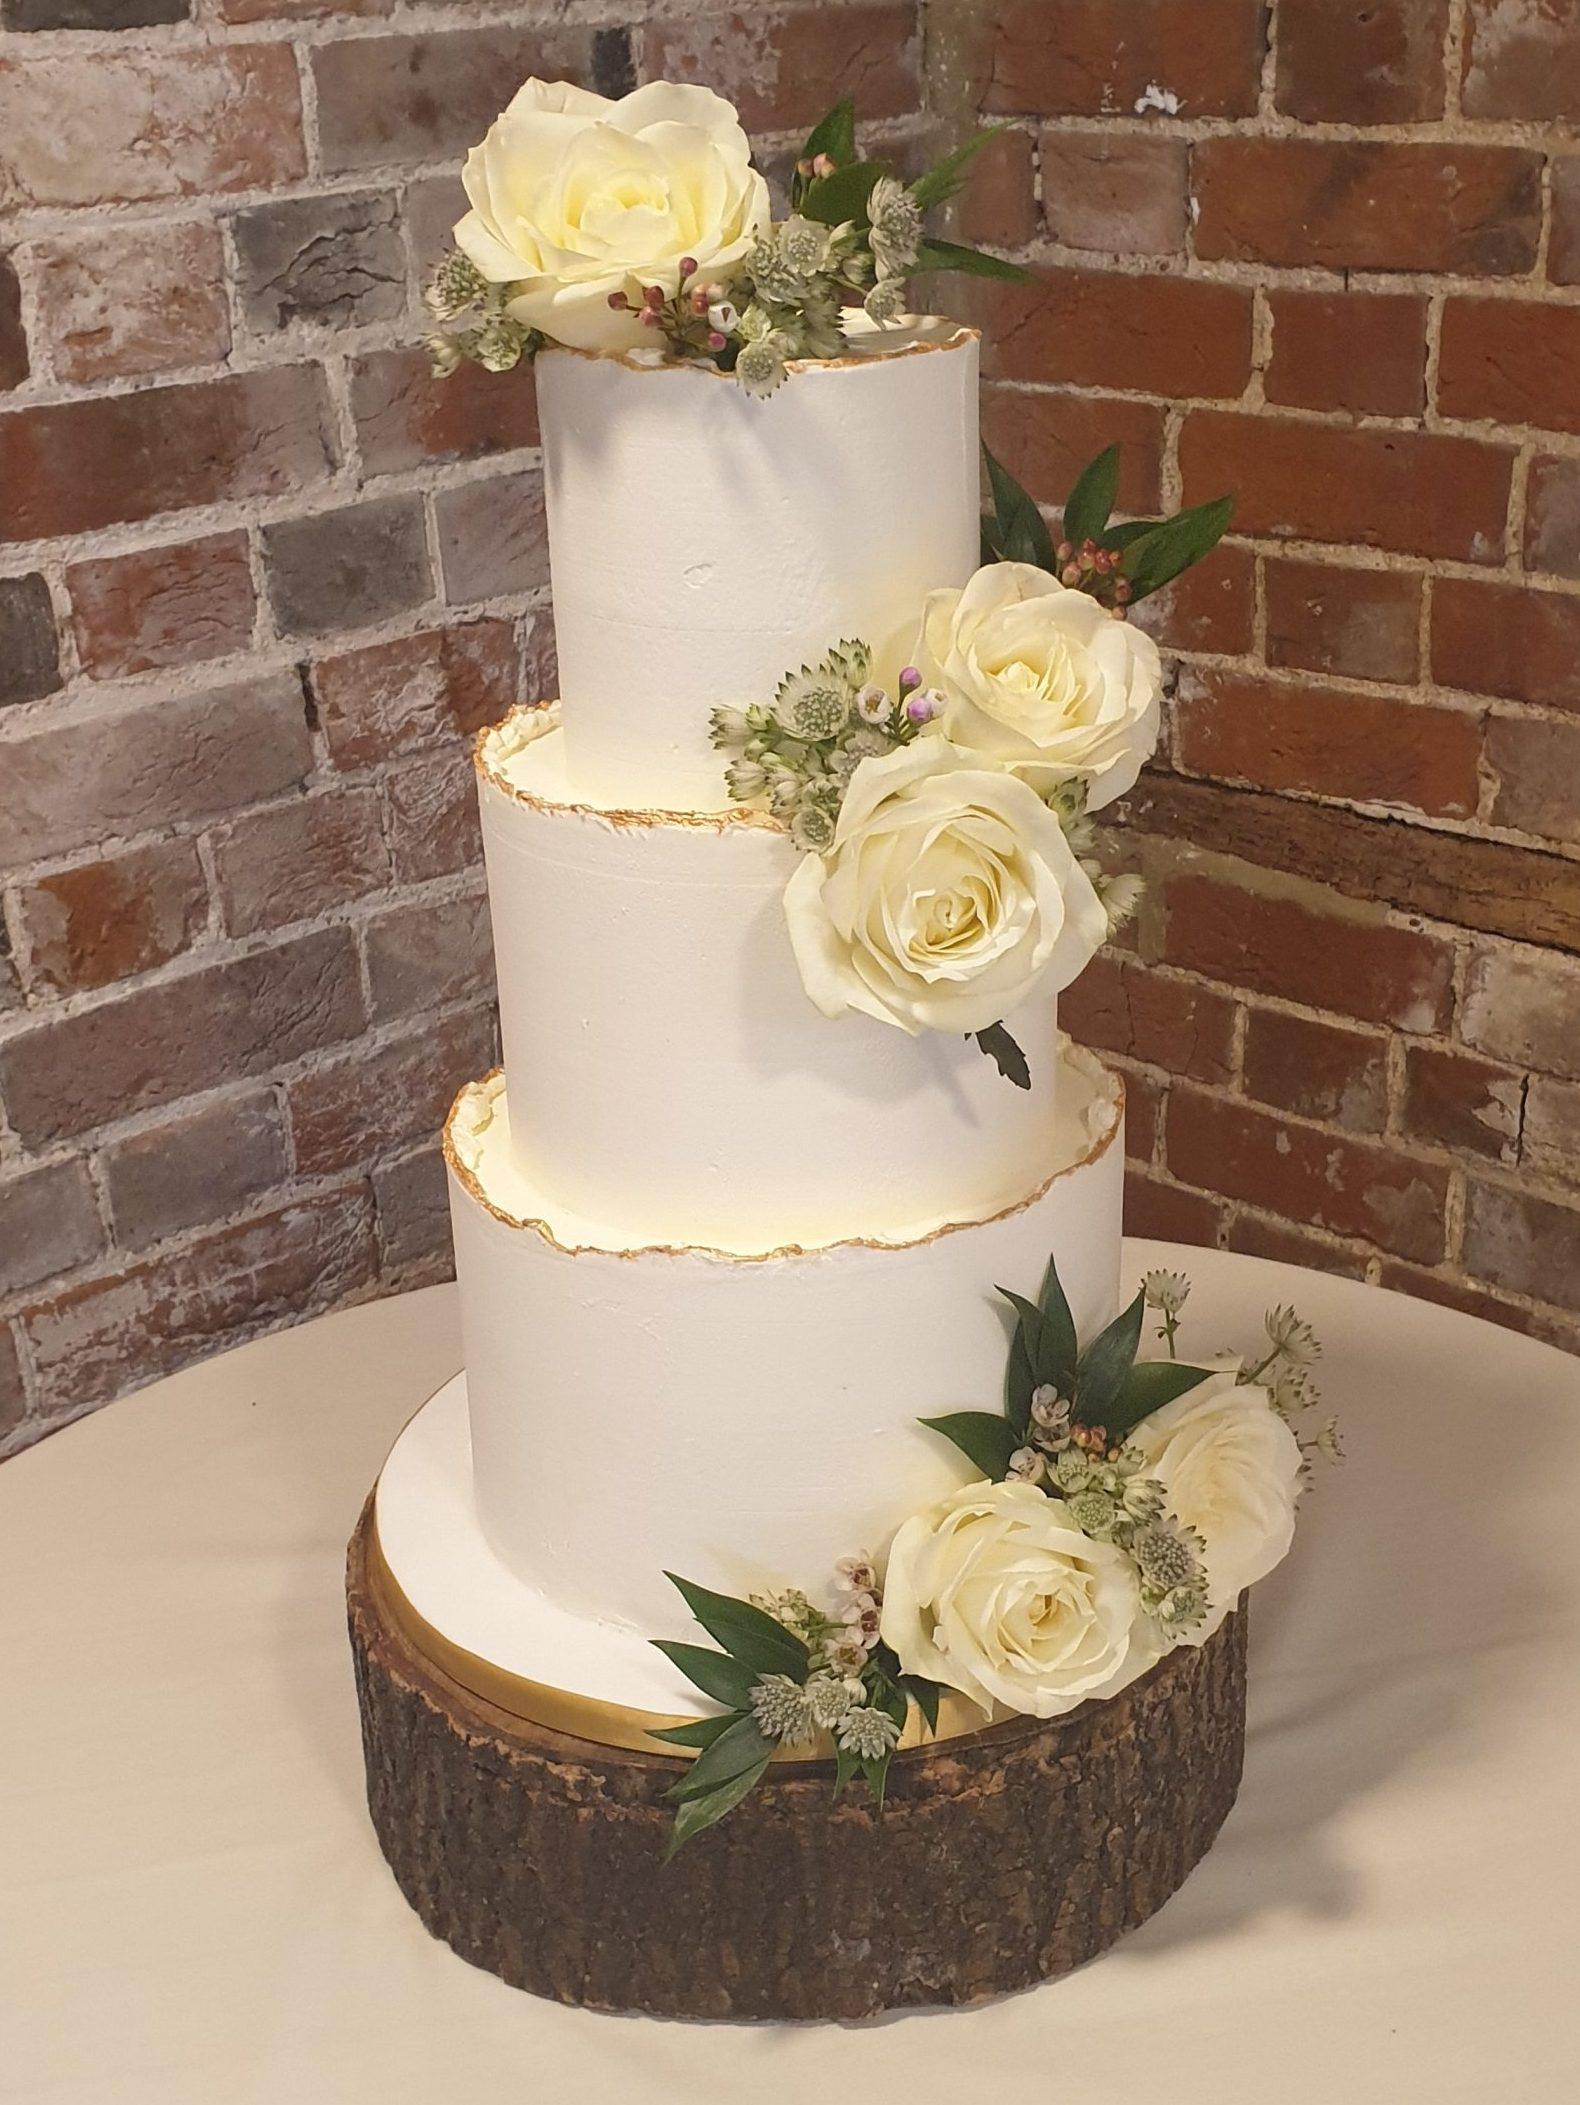 buttercream wedding cake fresh flowers gold weddingcake gaynes park epping essex wedding venue